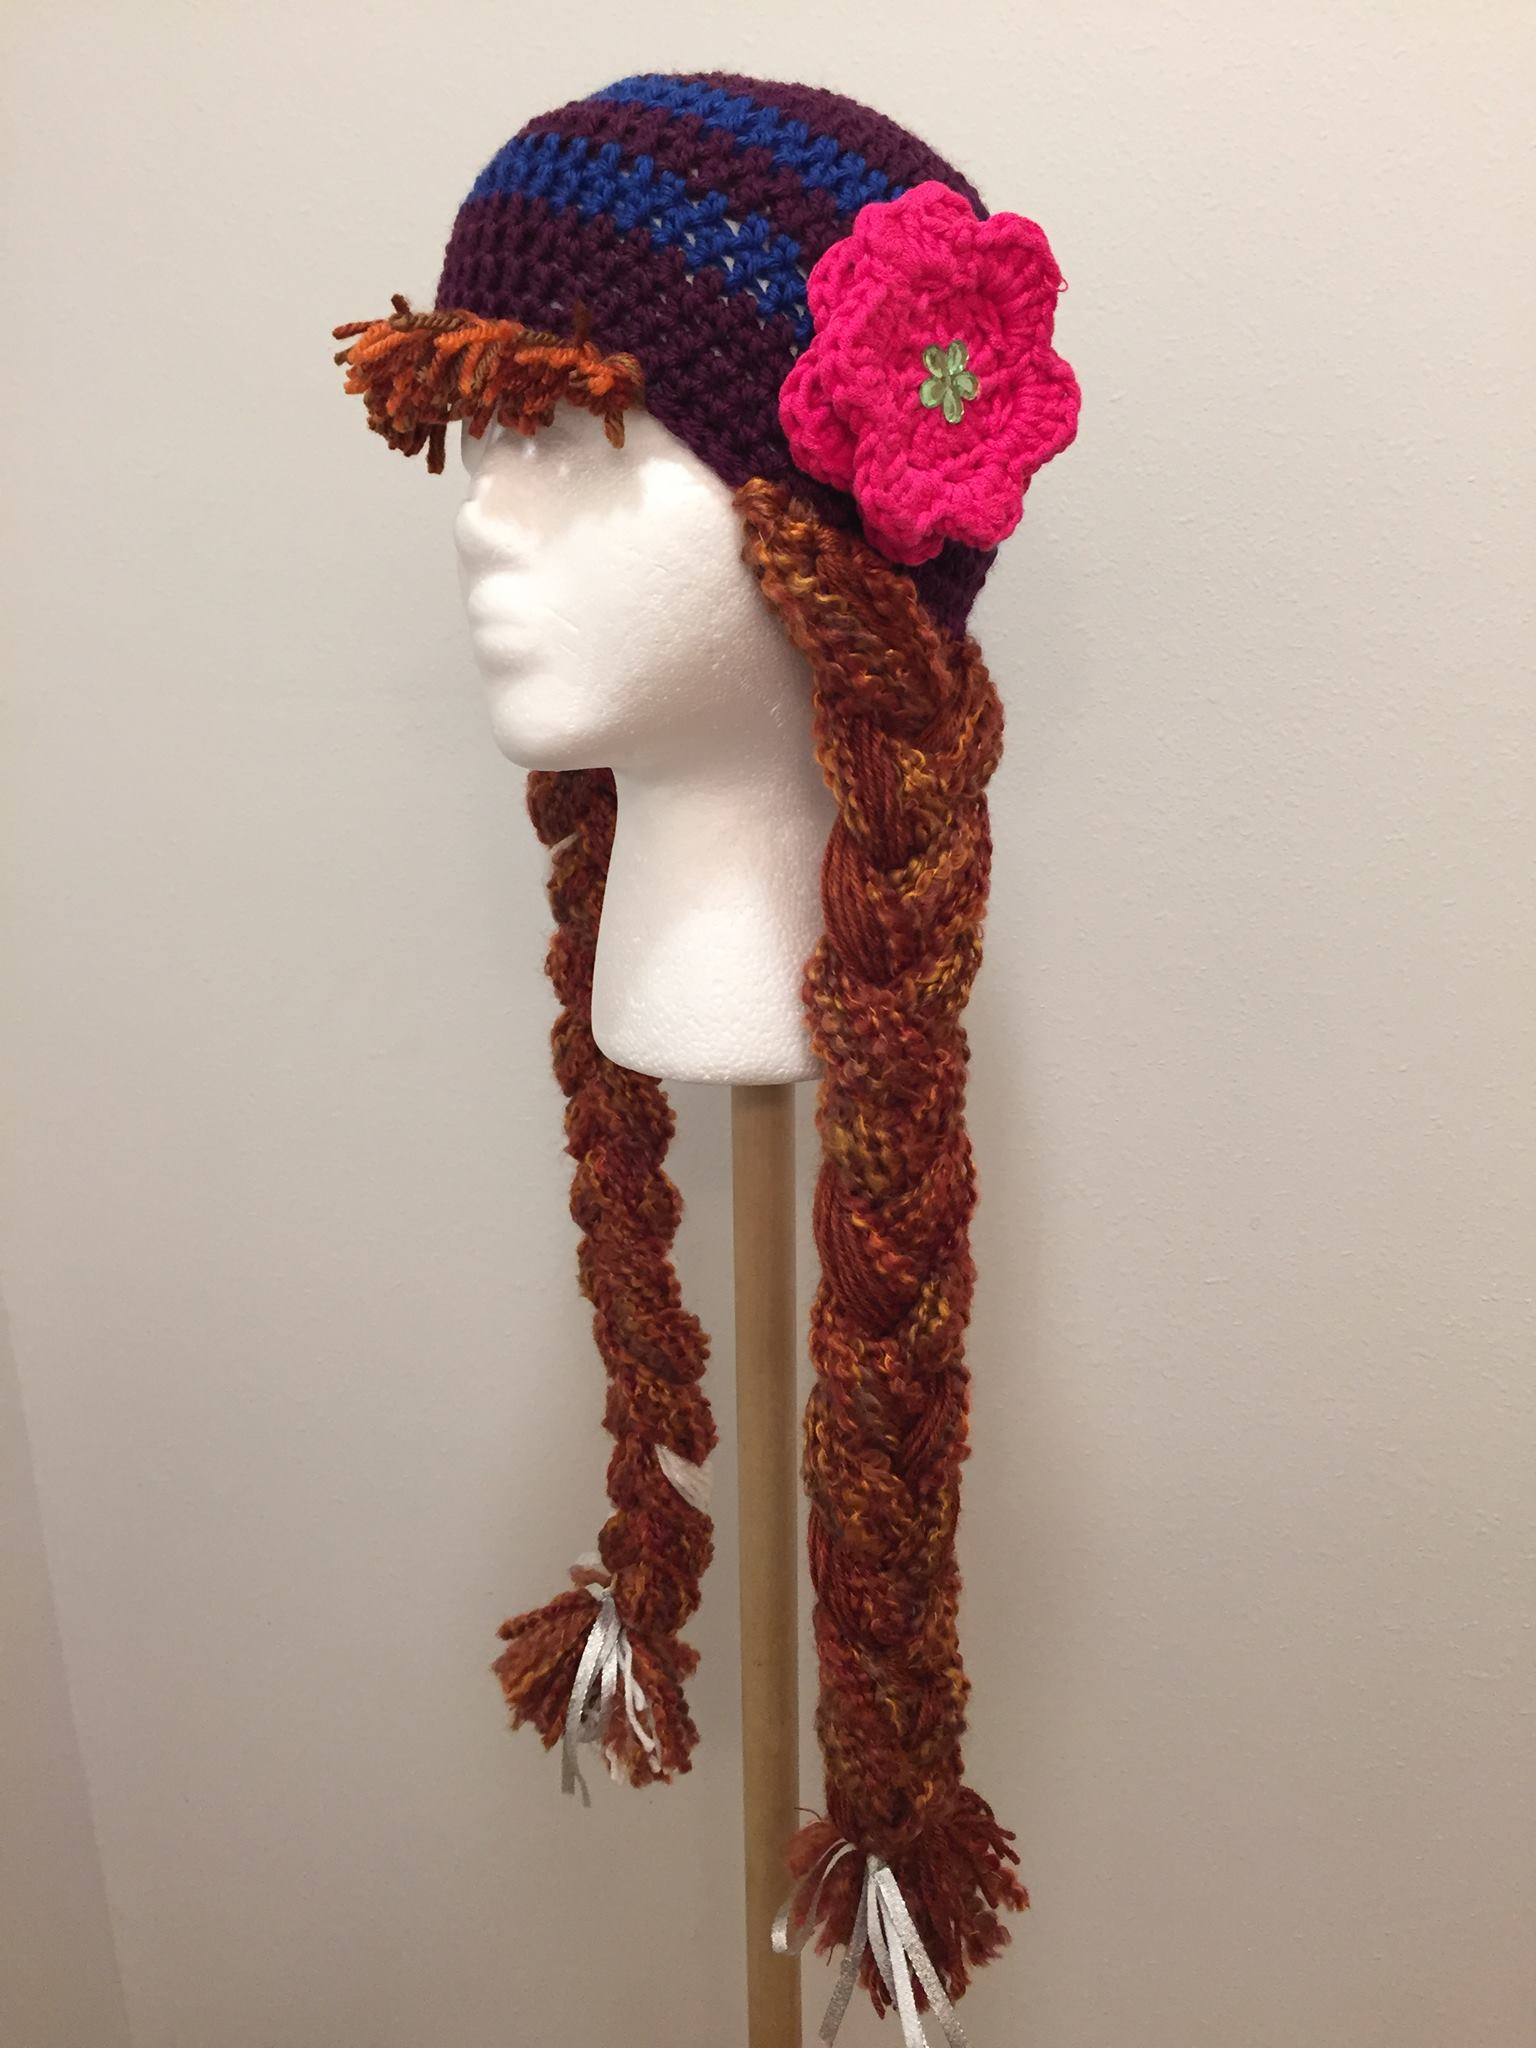 Princess Katie's yarn lives on